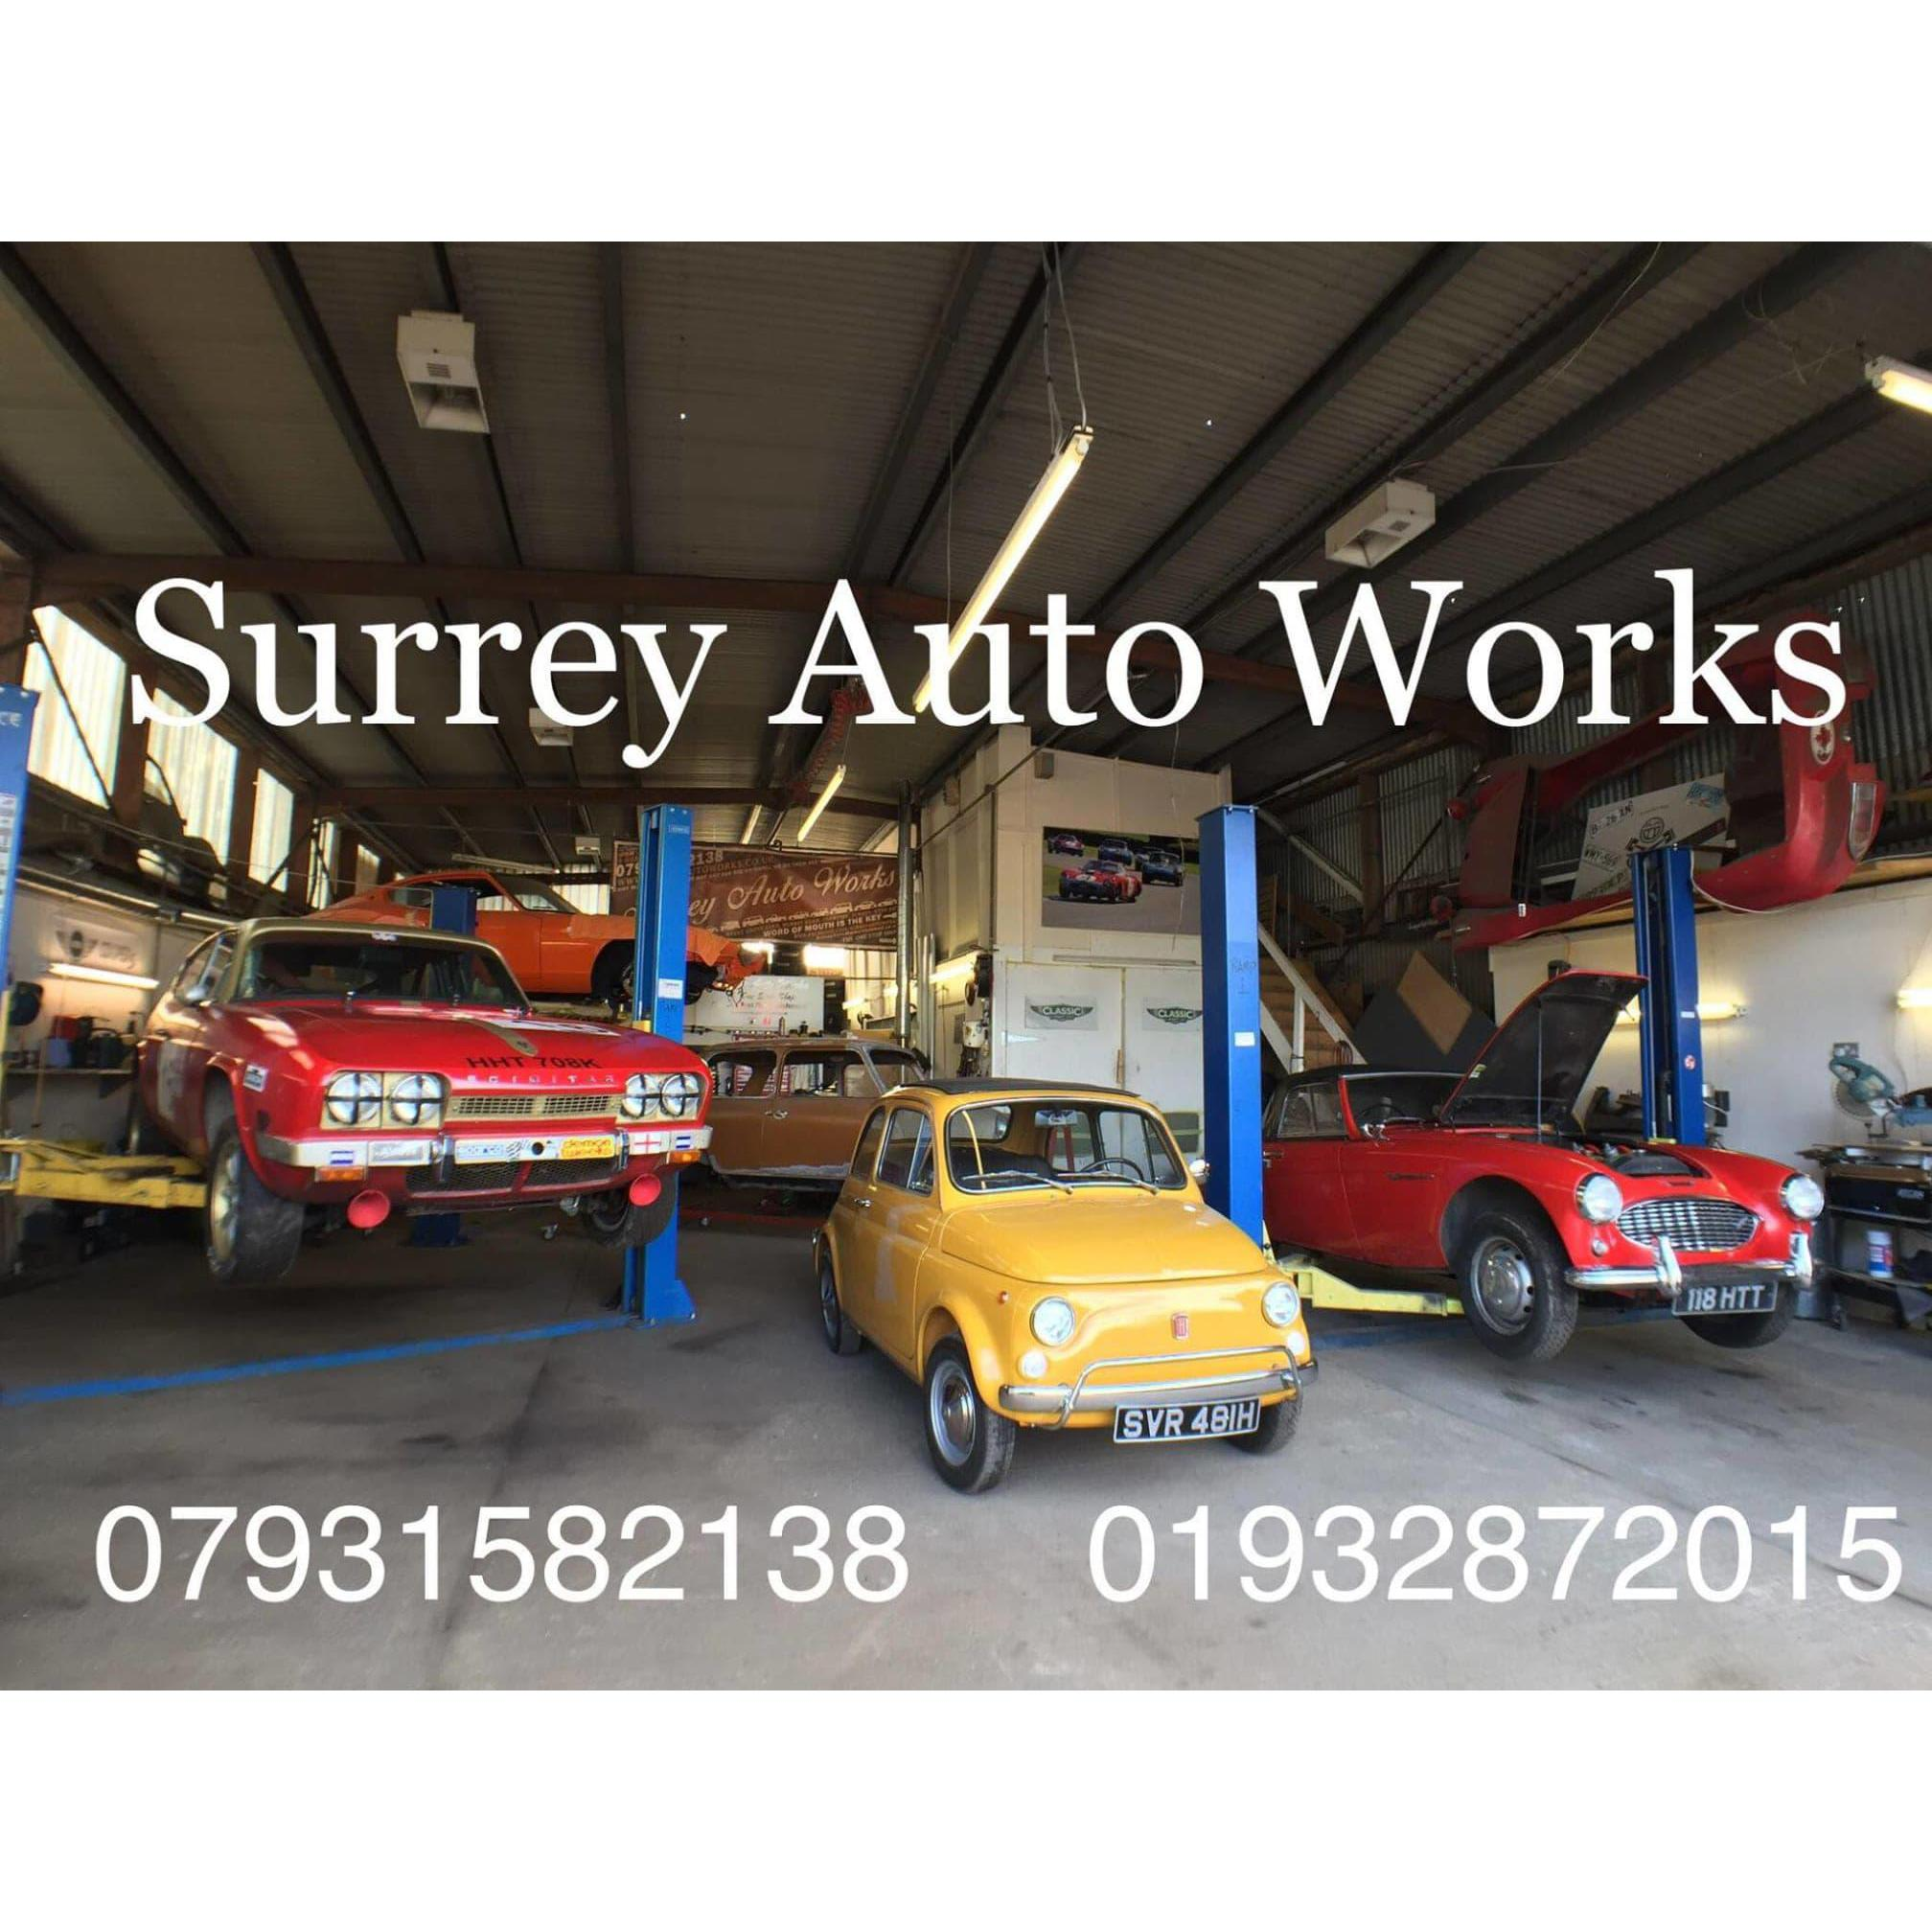 Surrey Auto Works Ltd - Chertsey, Surrey KT16 0HT - 01932 872015   ShowMeLocal.com